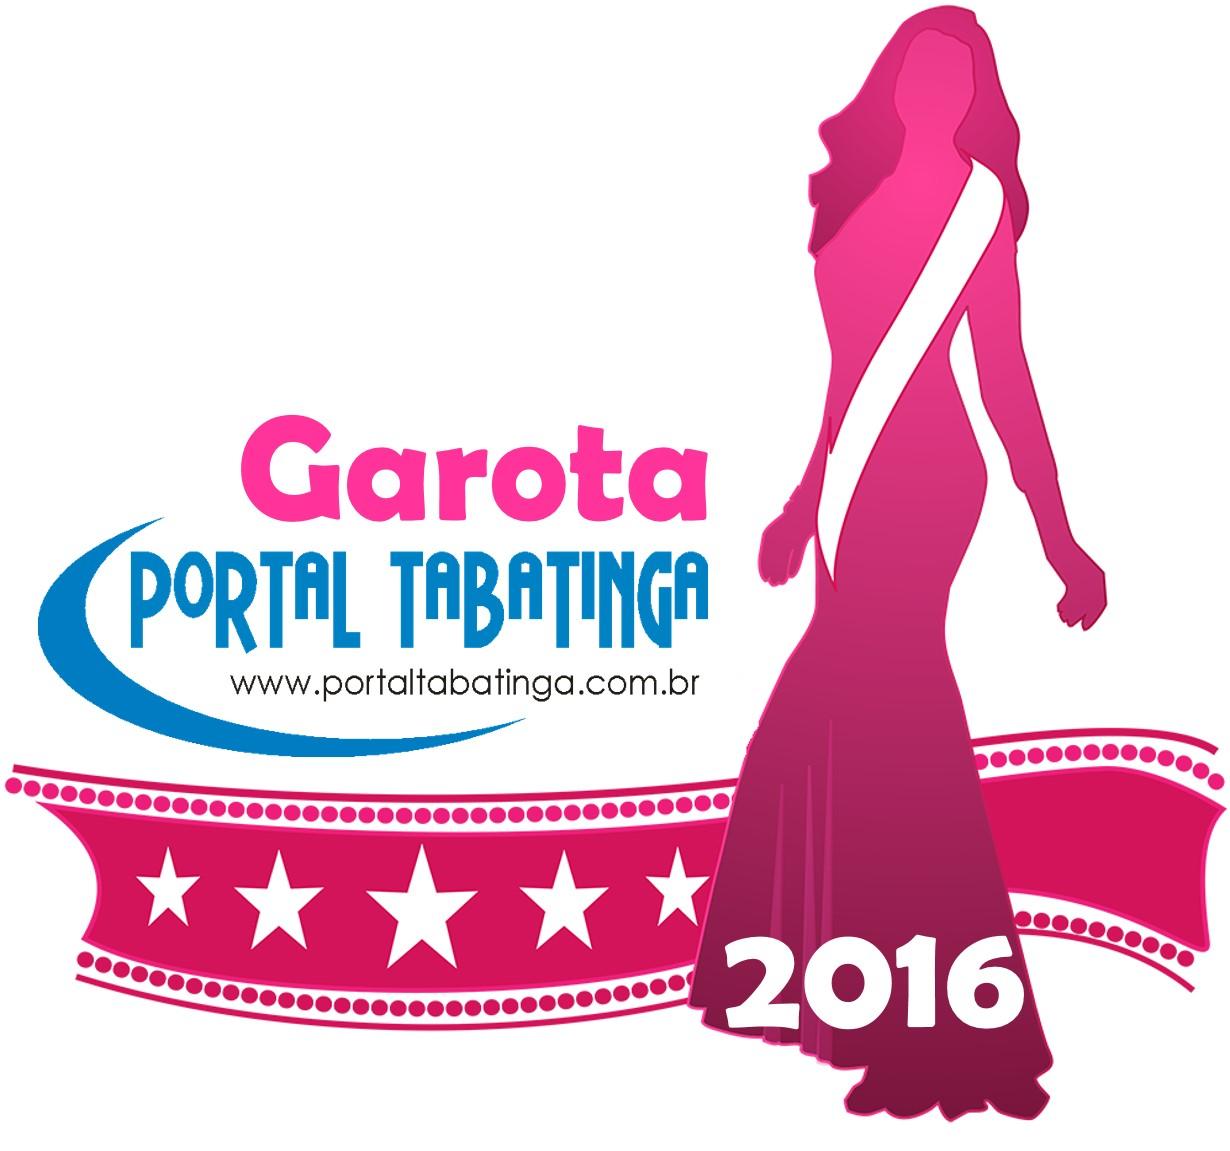 Photo of Concurso Beleza para escolha da Garota Portal Tabatinga 2016